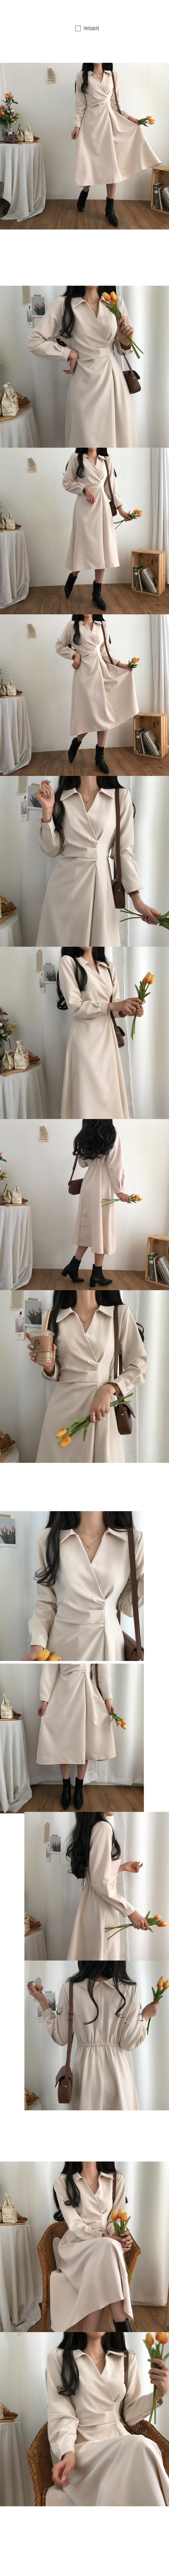 Viyola Kara Shirring Long Dress